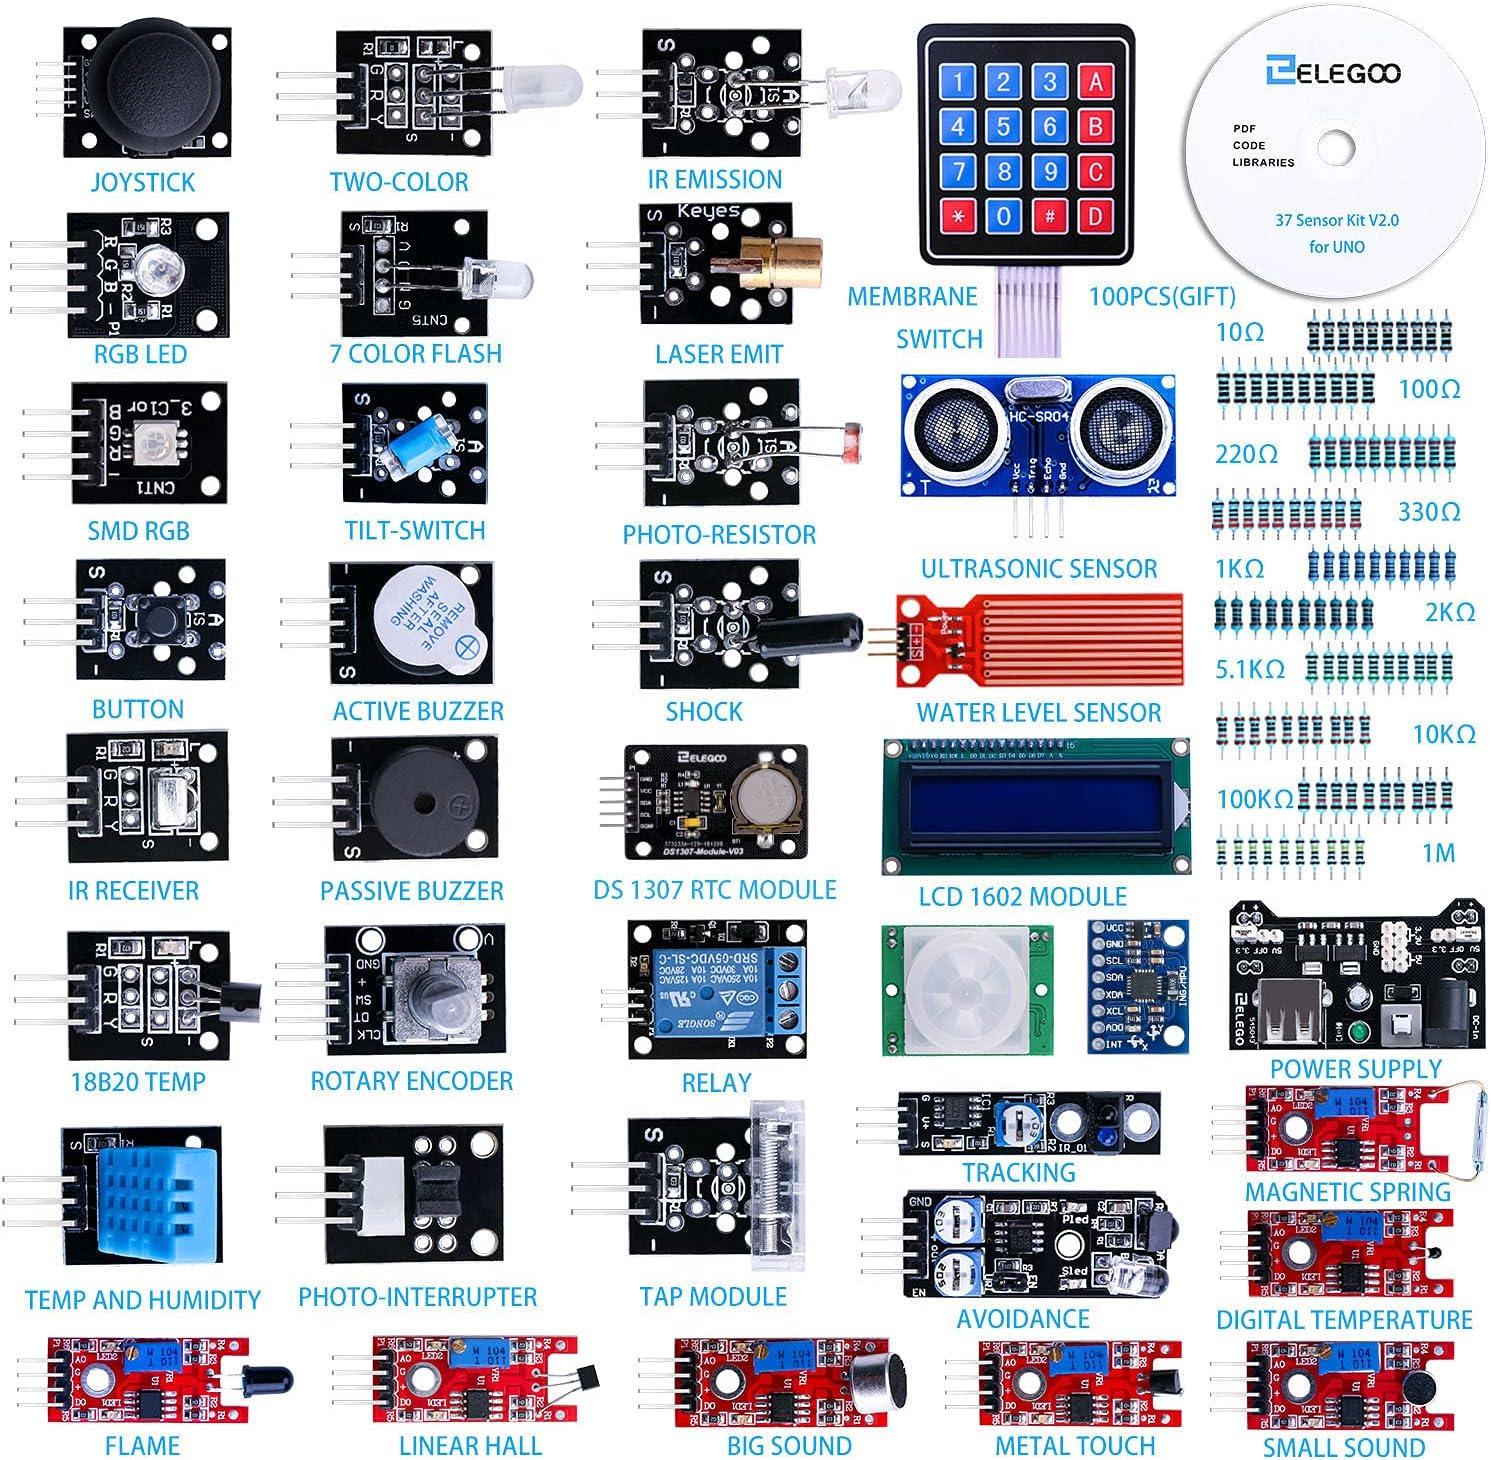 ELEGOO Upgraded 37 in 1 Sensor Modules Kit with Tutorial Compatible with Arduino IDE UNO R3 MEGA Nano